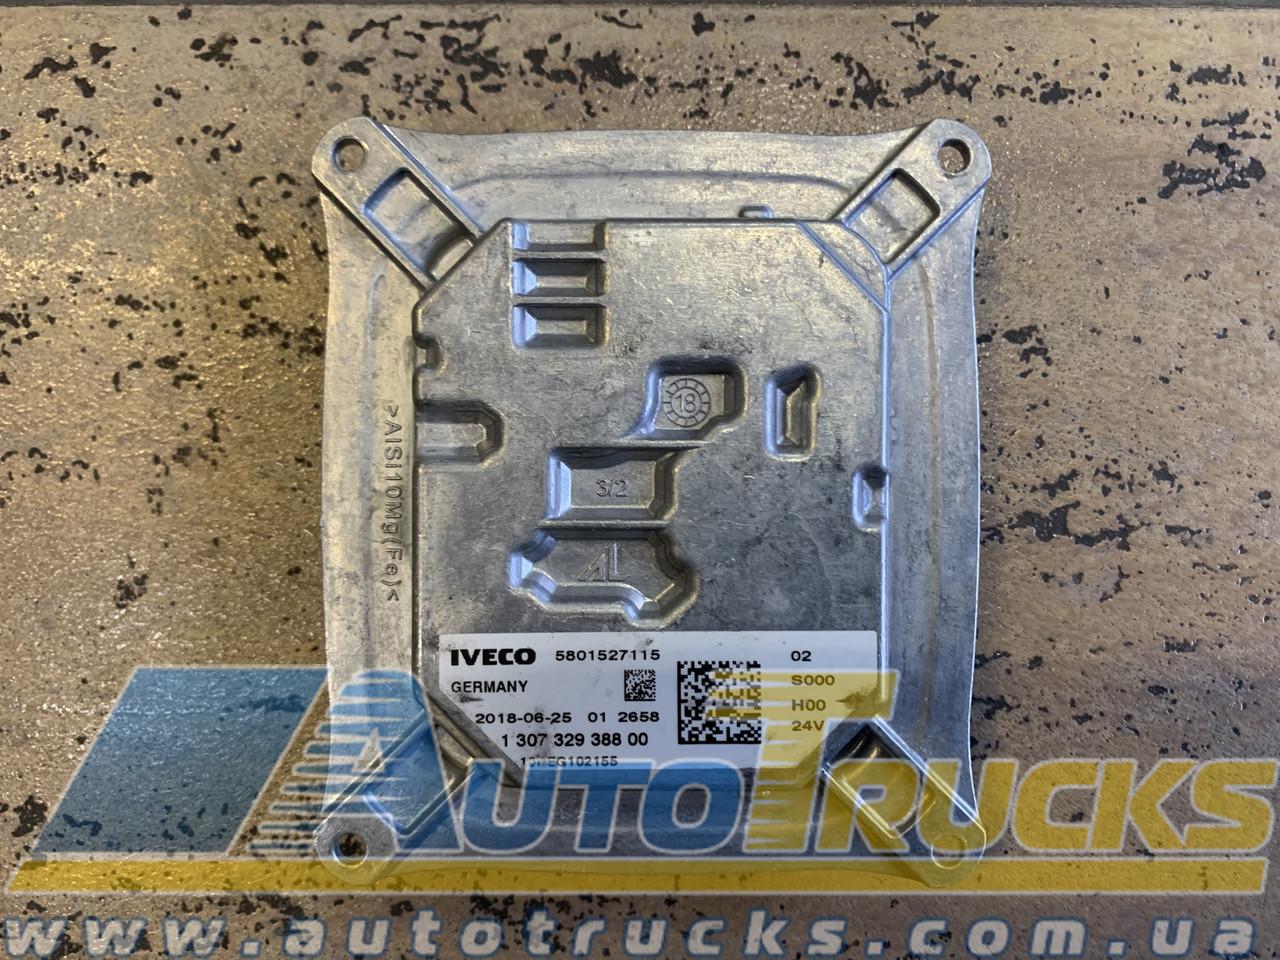 Блок розпалу 24V Б/у для IVECO (130732938800; 5801527115)